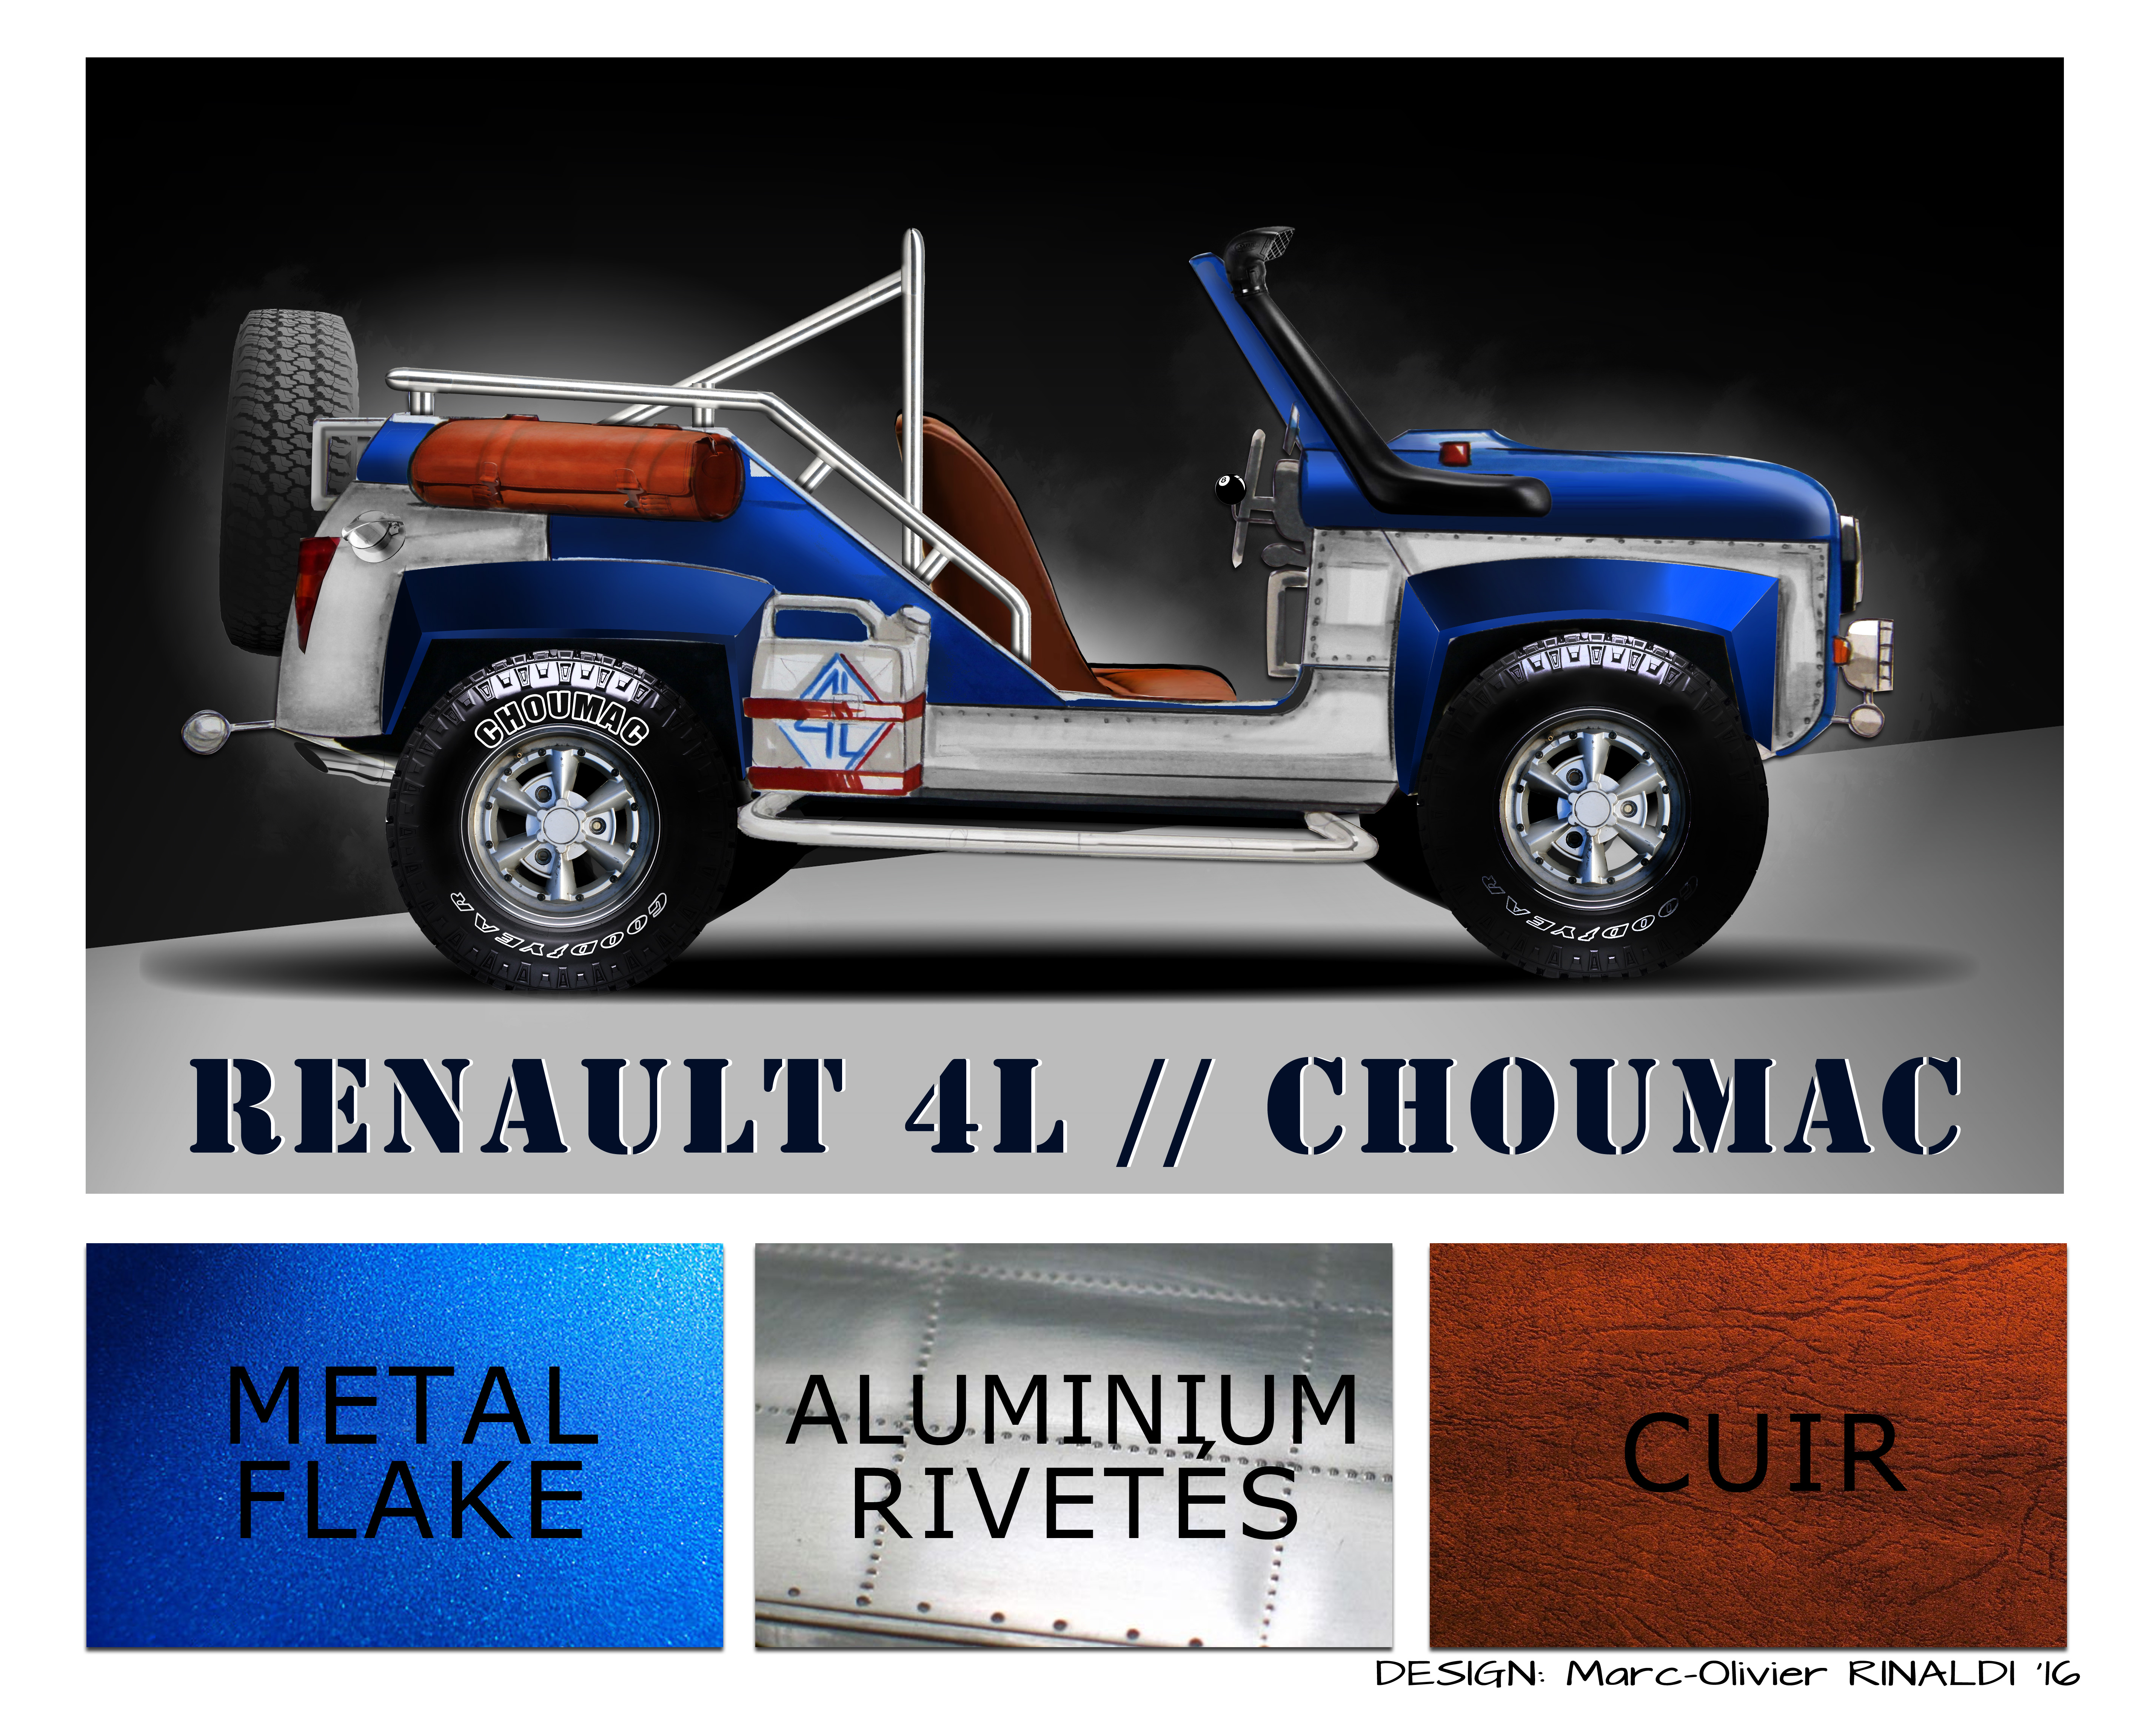 choumac2